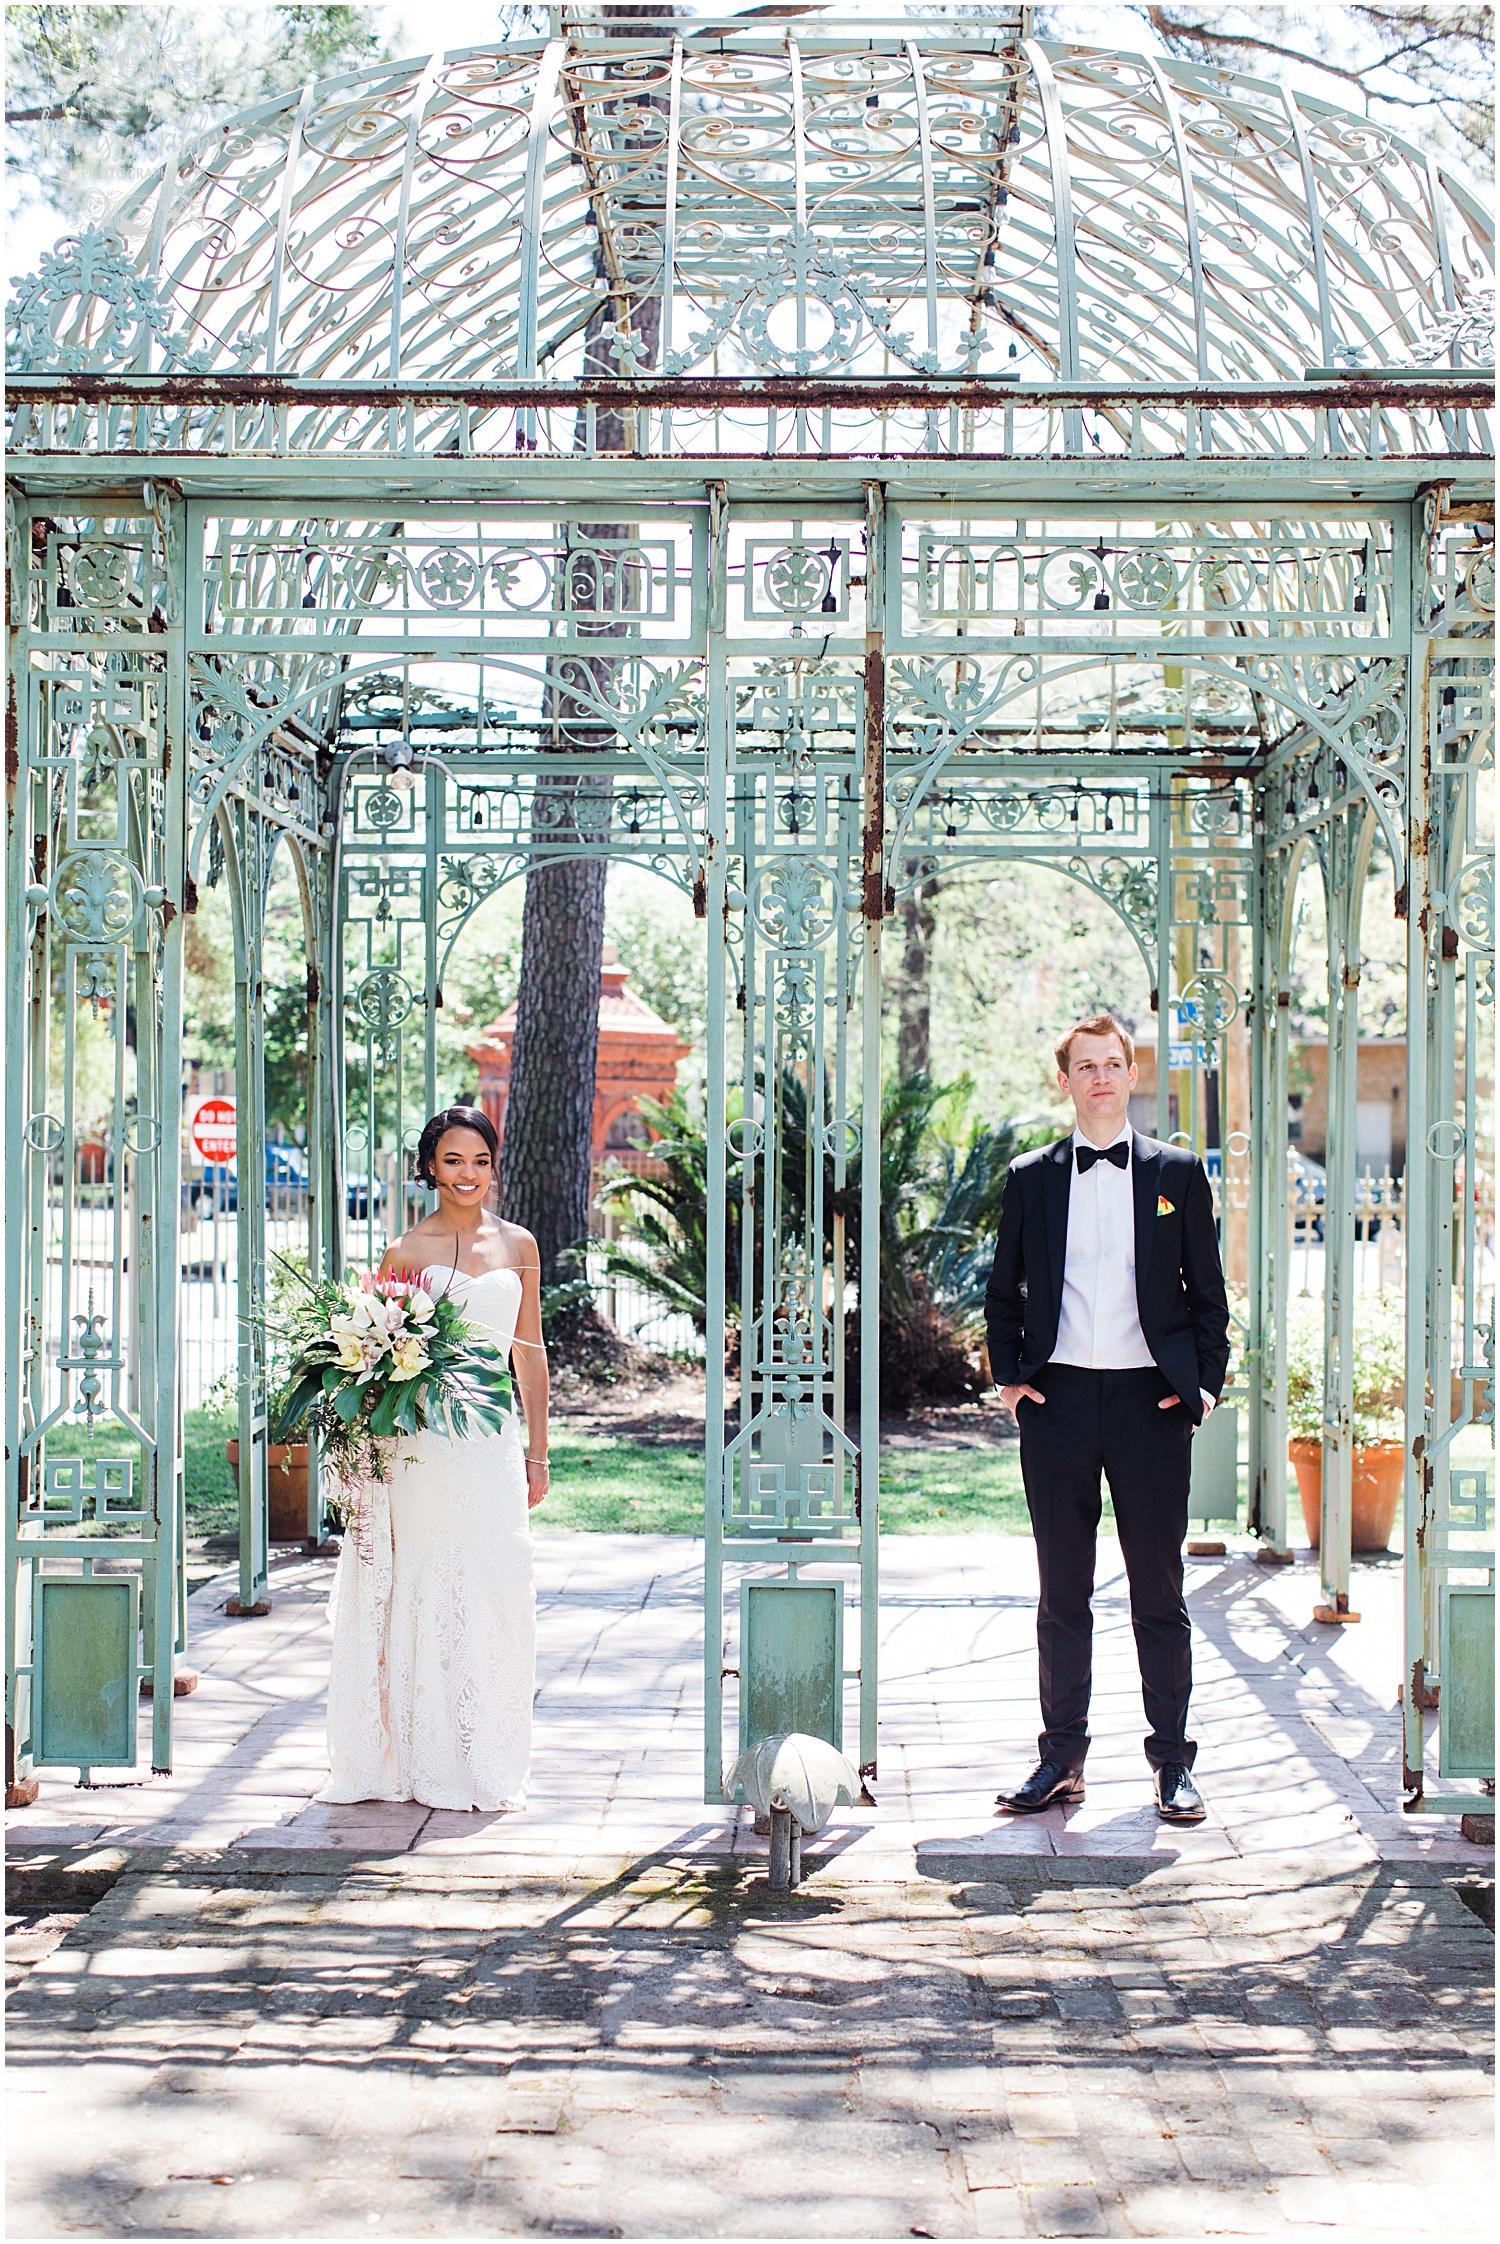 NEW ORLEANS WEDDING   BENACHI HOUSE   SARAH & MICHAEL   MARISSA CRIBBS PHOTOGRAPHY_4413.jpg